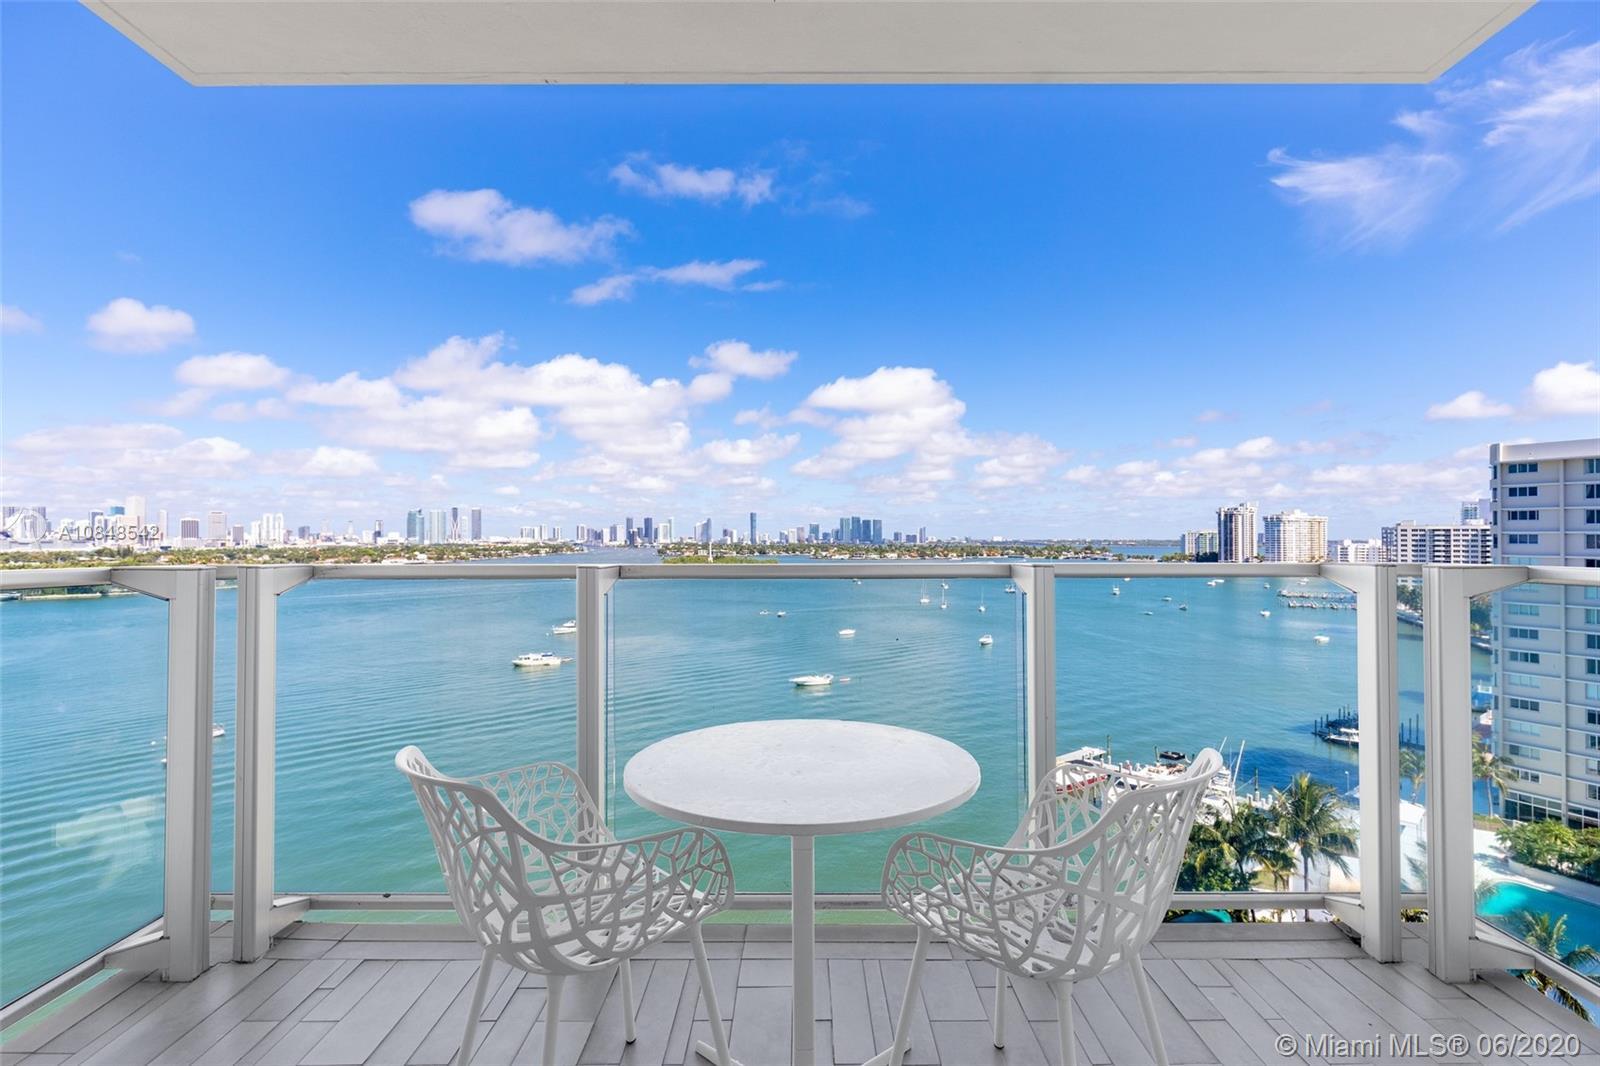 1100 West Ave #1222, Miami Beach, FL 33139 - Miami Beach, FL real estate listing